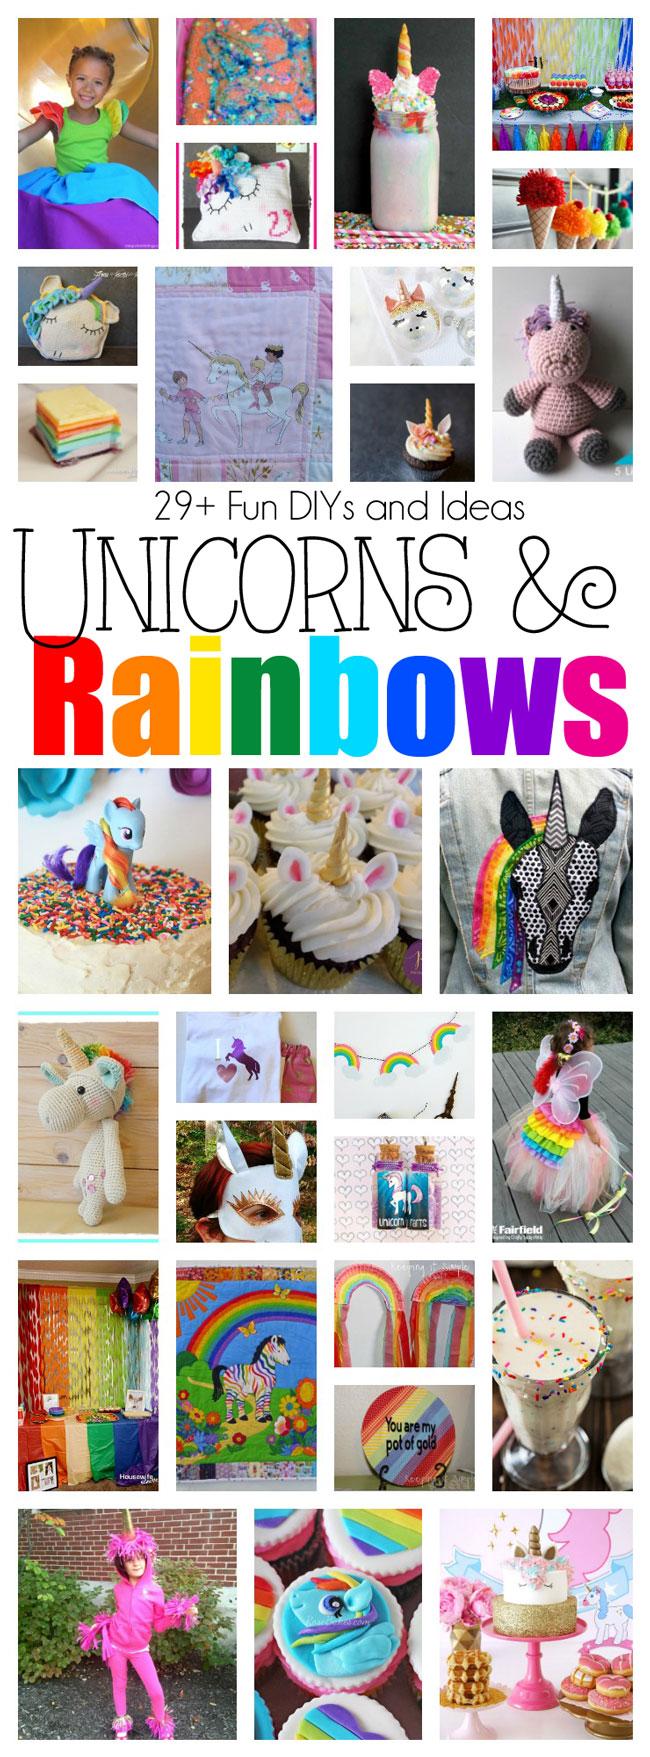 DIY Unicorns Rainbows Crafts and Party ideas